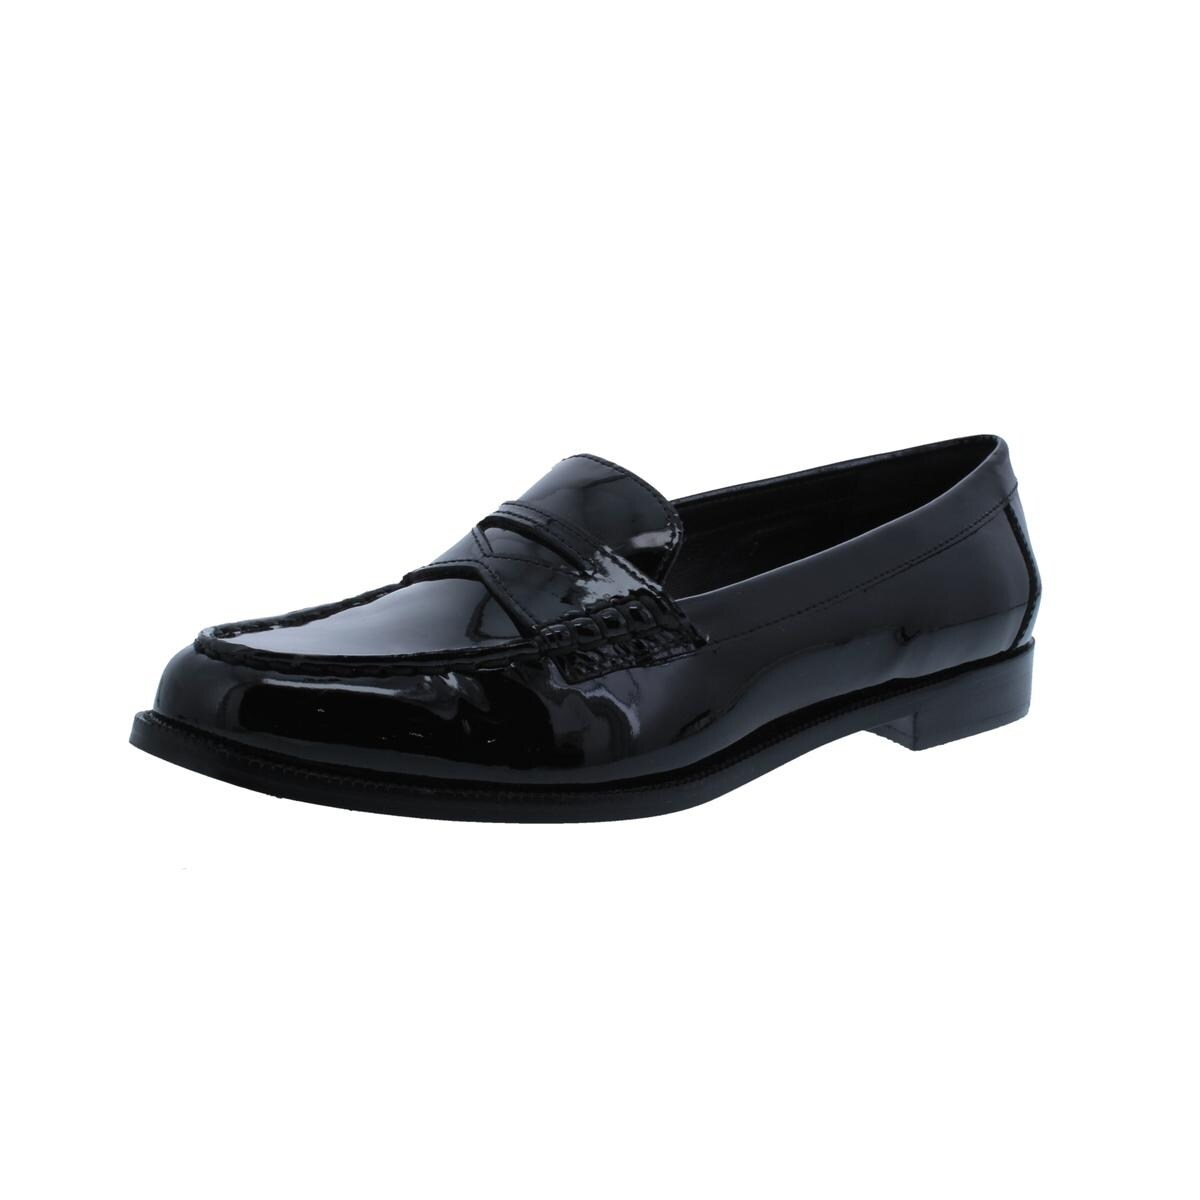 6056421e36d Shop Lauren Ralph Lauren Womens Barrett Penny Loafers Slip On - Free ...